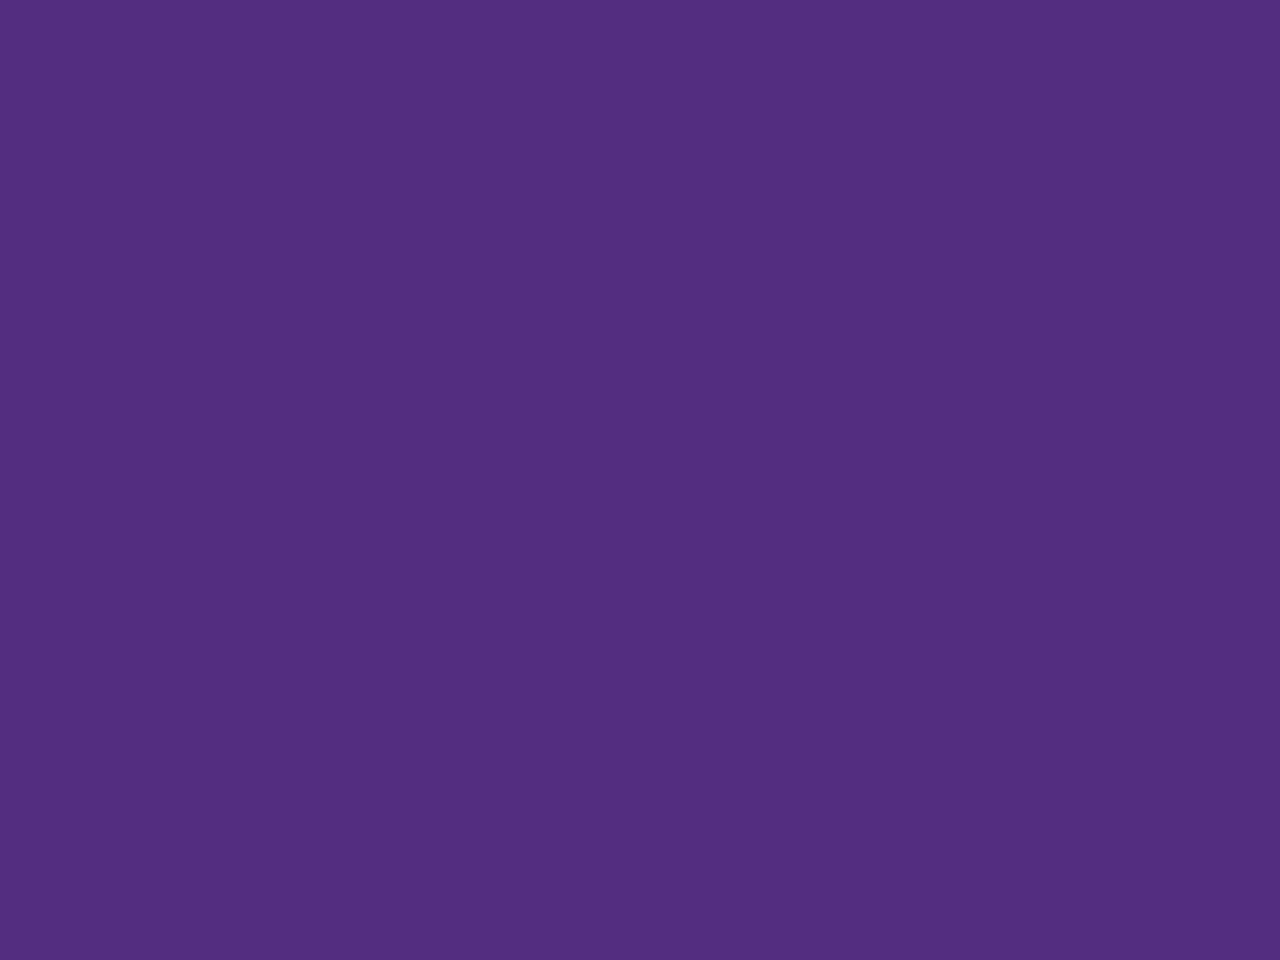 1280x960 Regalia Solid Color Background